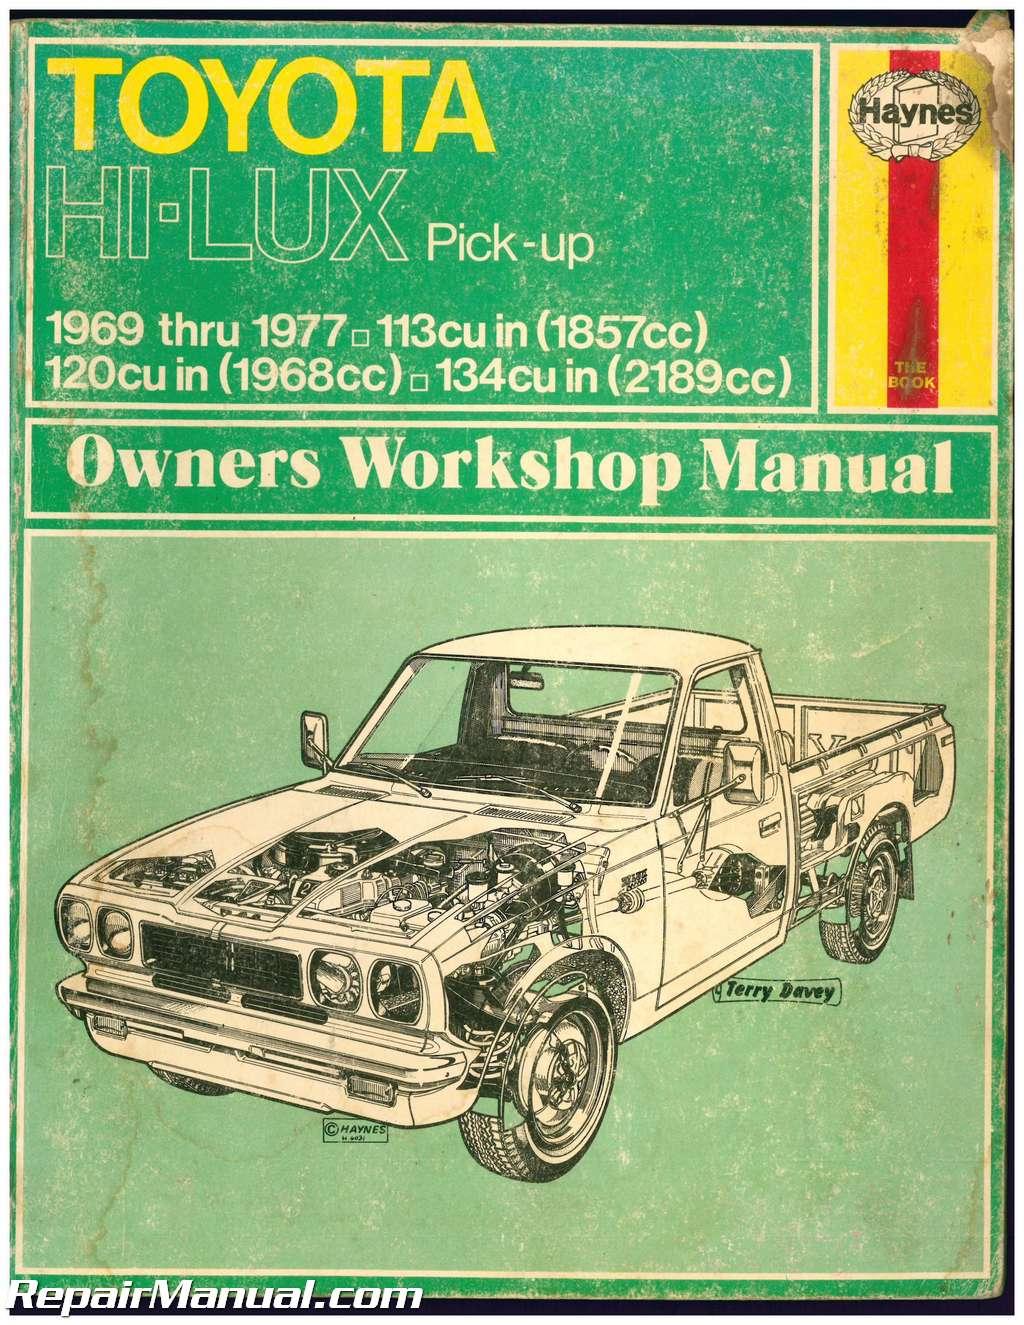 used haynes toyota pick up 1969 1977 auto repair manual rh repairmanual com Haynes Repair Manuals PDF Haynes Repair Manuals Online